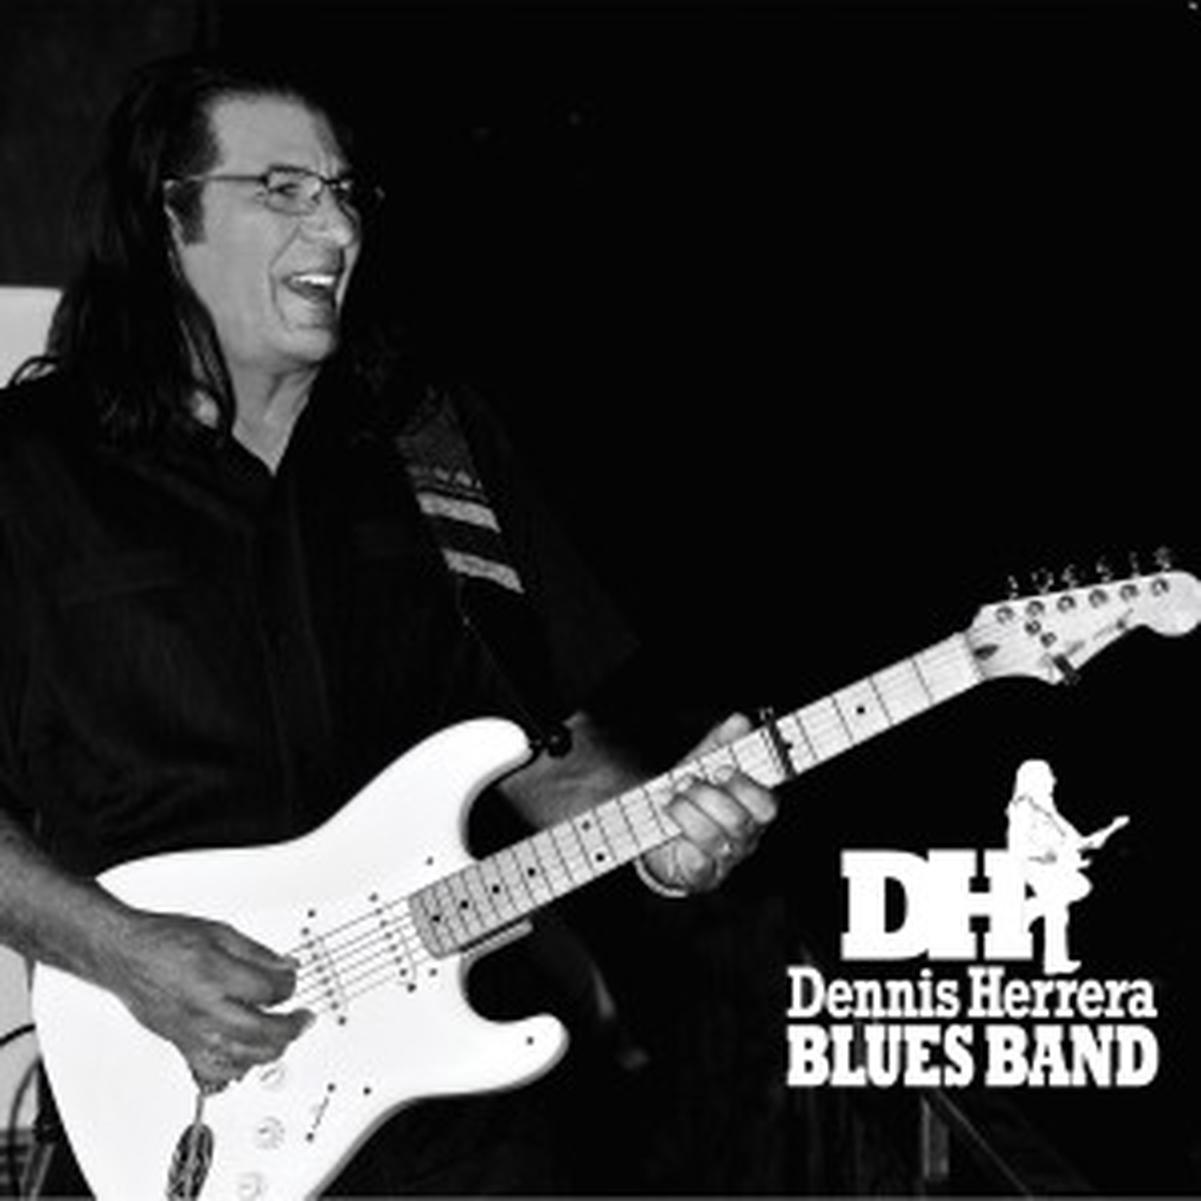 Dennis Herrera Blues Band